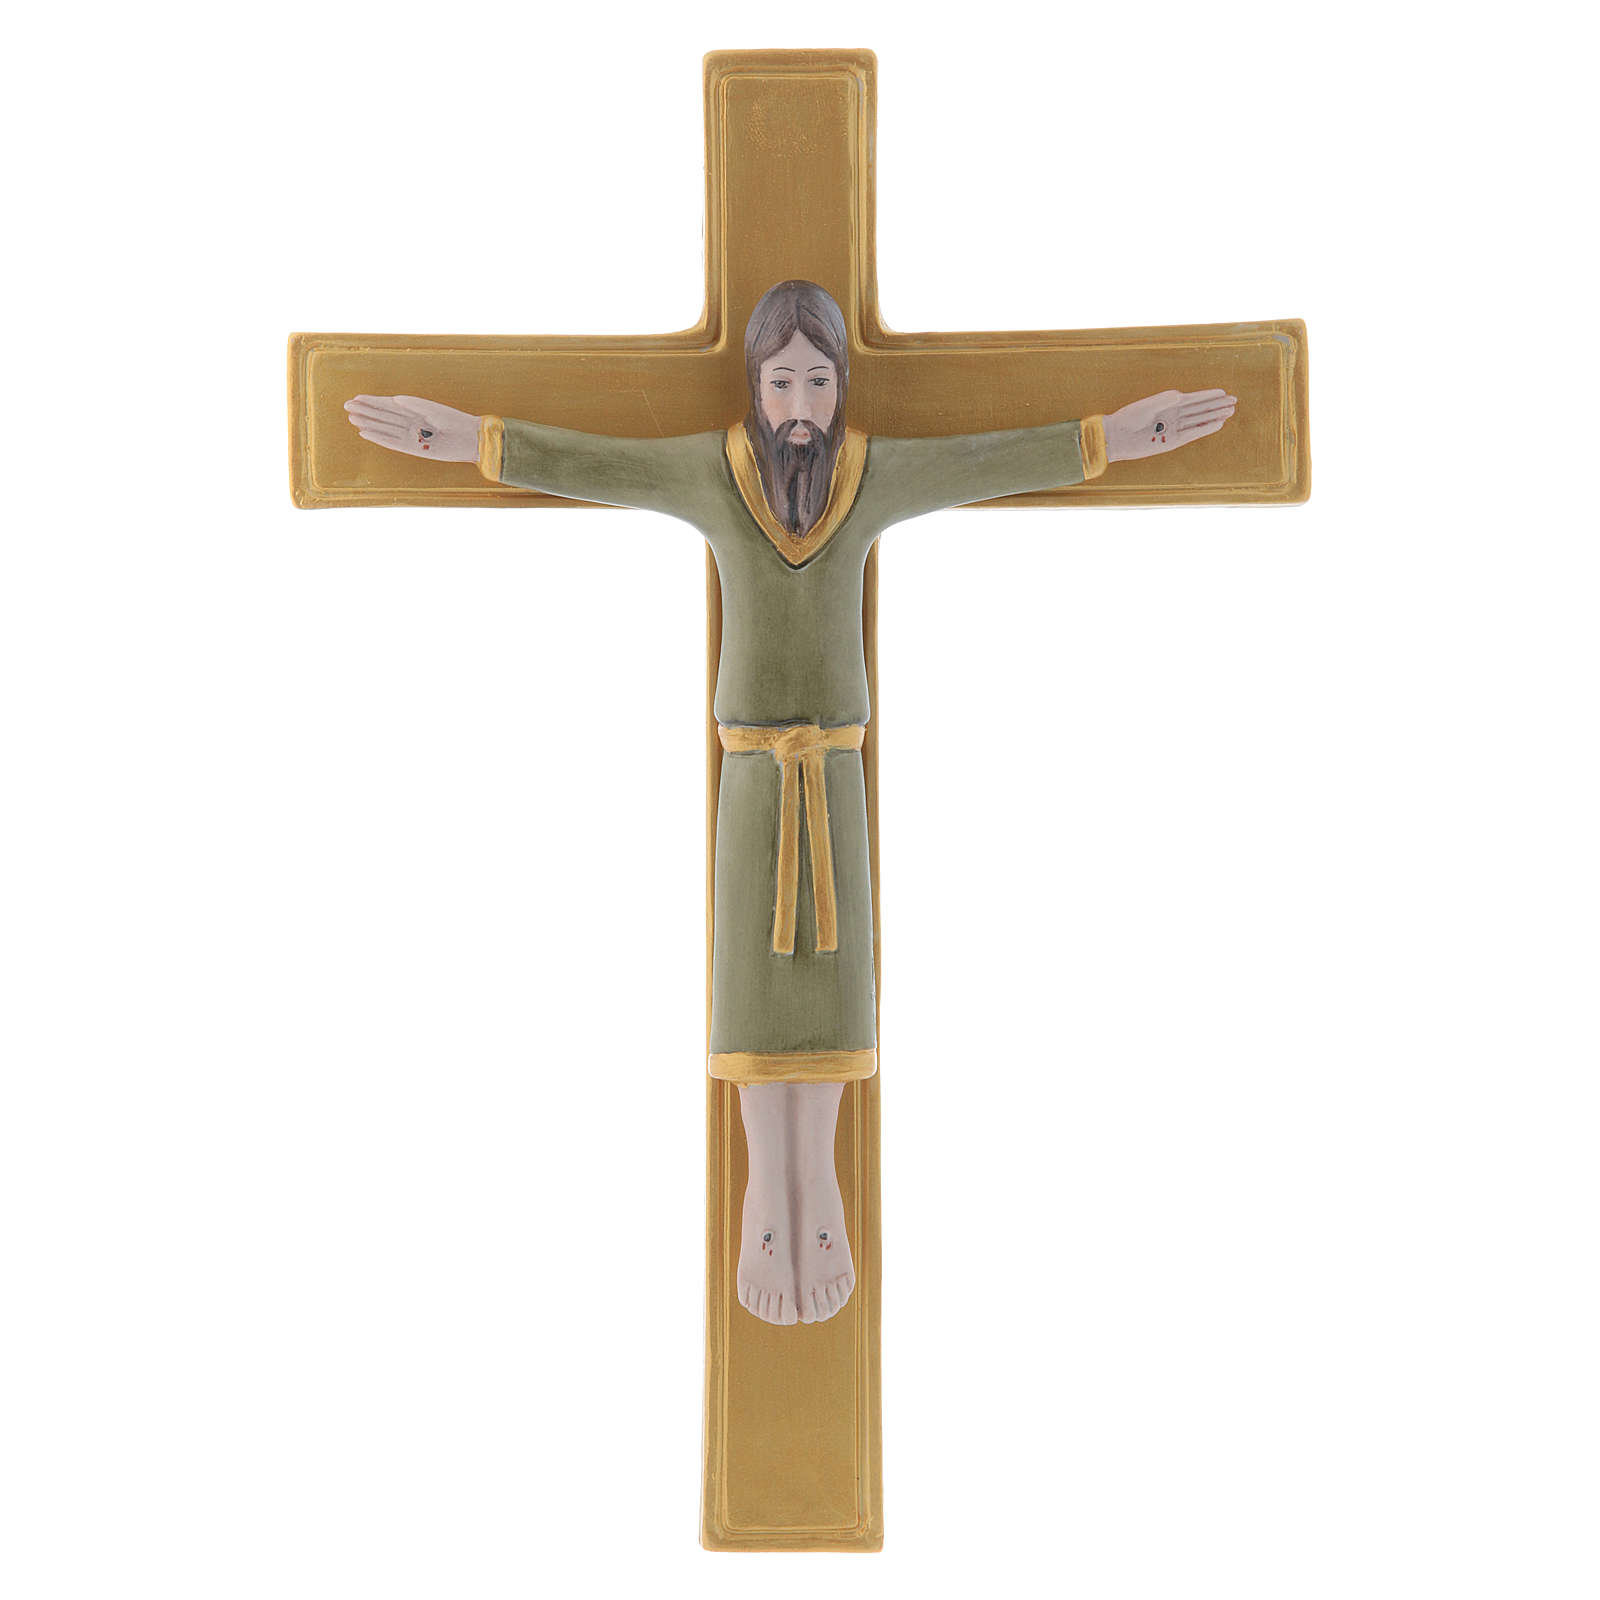 Bajorrelieve porcelana Pinton crucifijo con túnica verde cruz dorada 25x17 cm 4